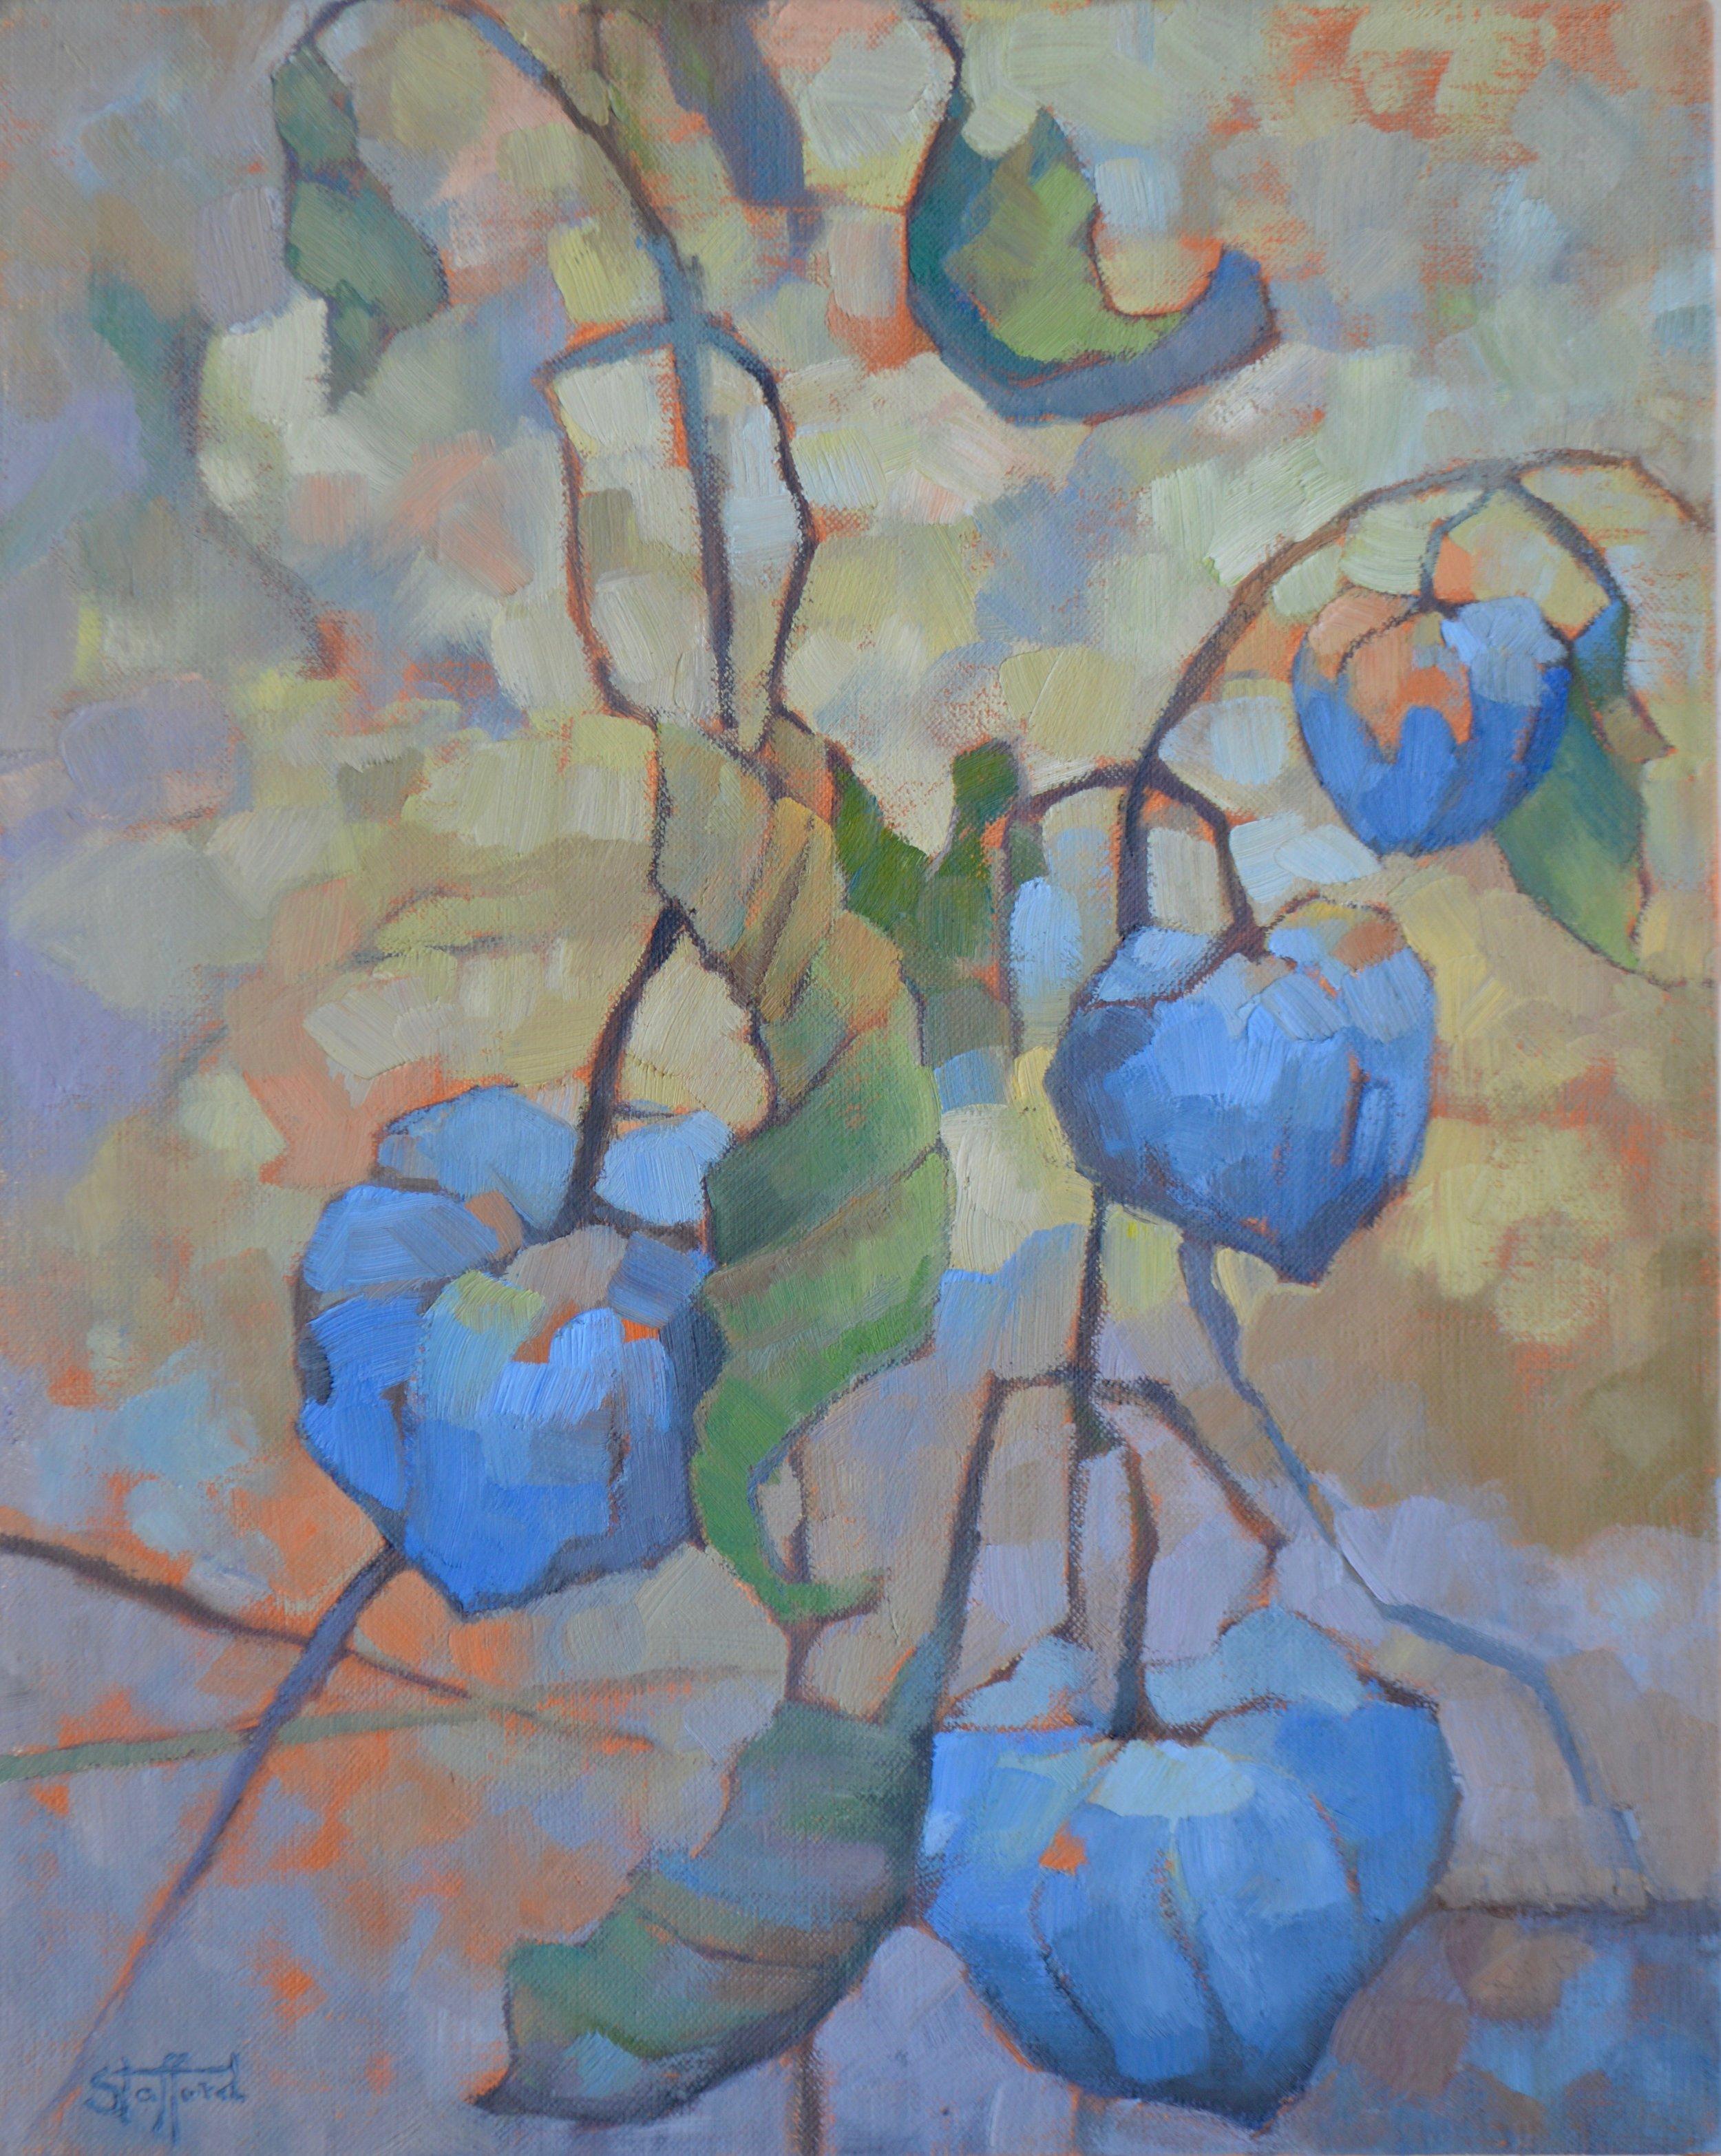 """Blue Lanterns"" oil on linen 16x20"